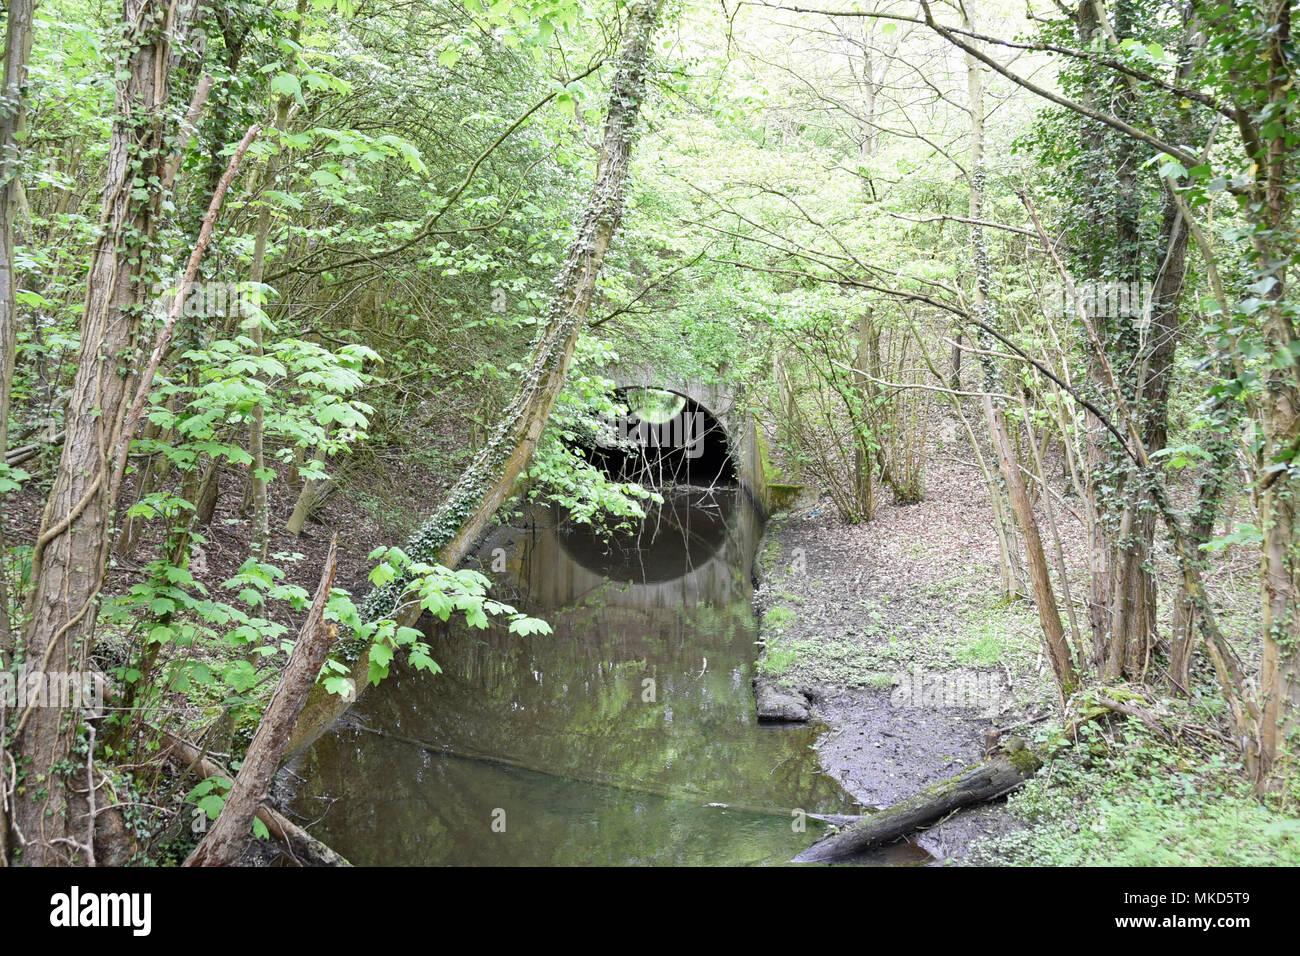 River Alder Bourne tunnel alongside the London M25 Orbital Motorway - Stock Image